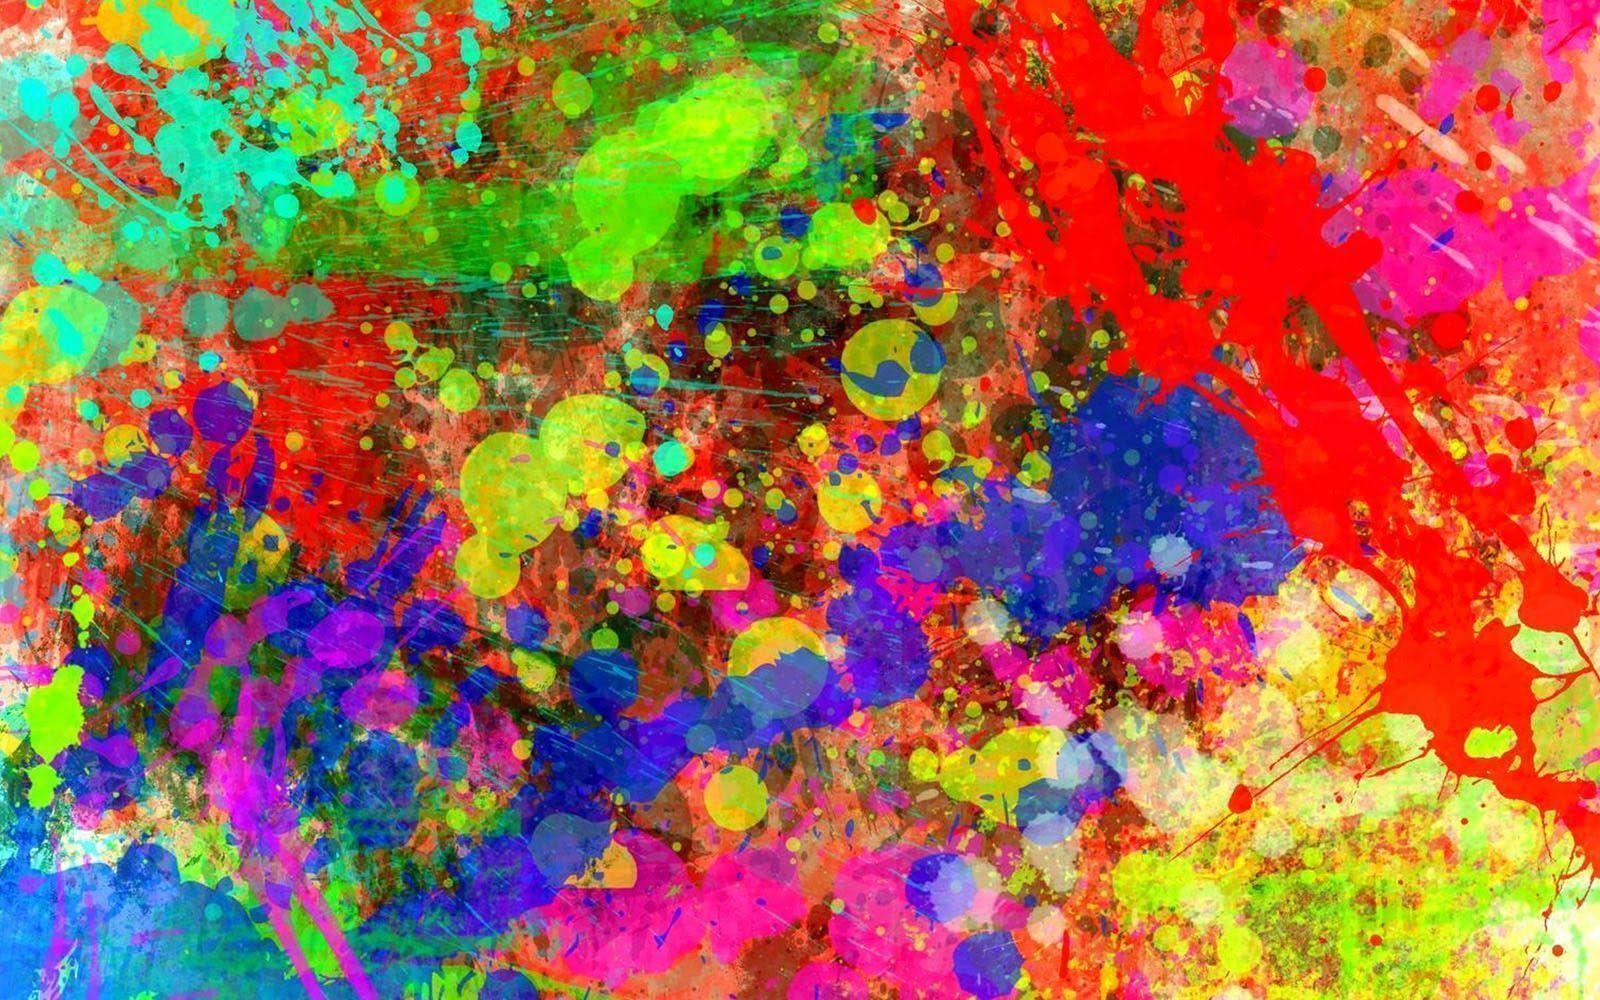 hd wallpapers splash art - photo #34